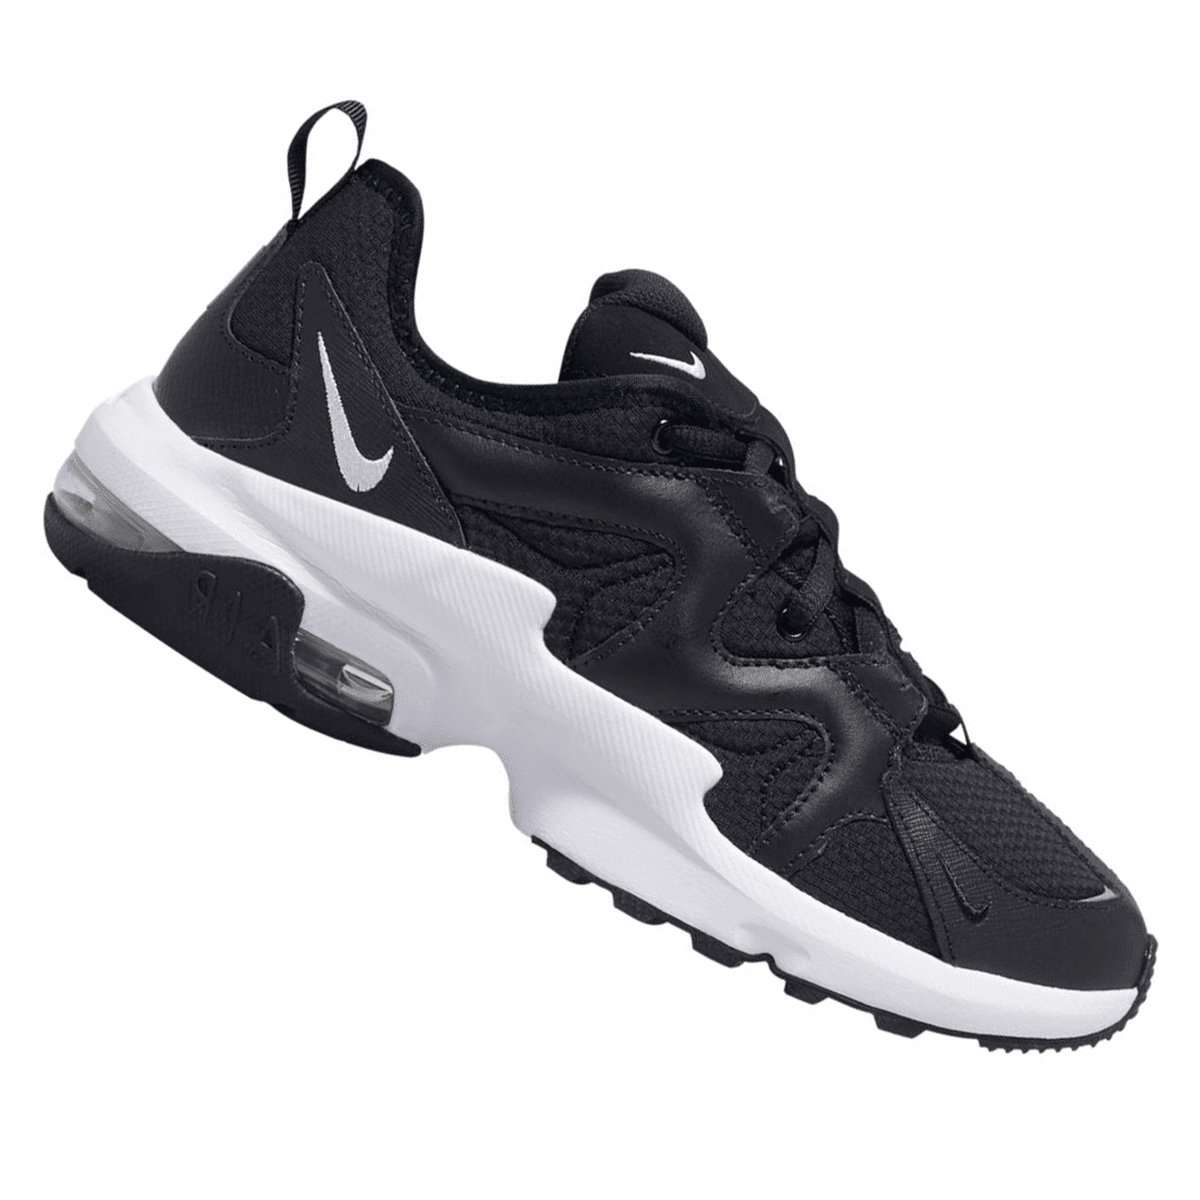 Nike Air Max Graviton női szabadidőcipő feketefehér